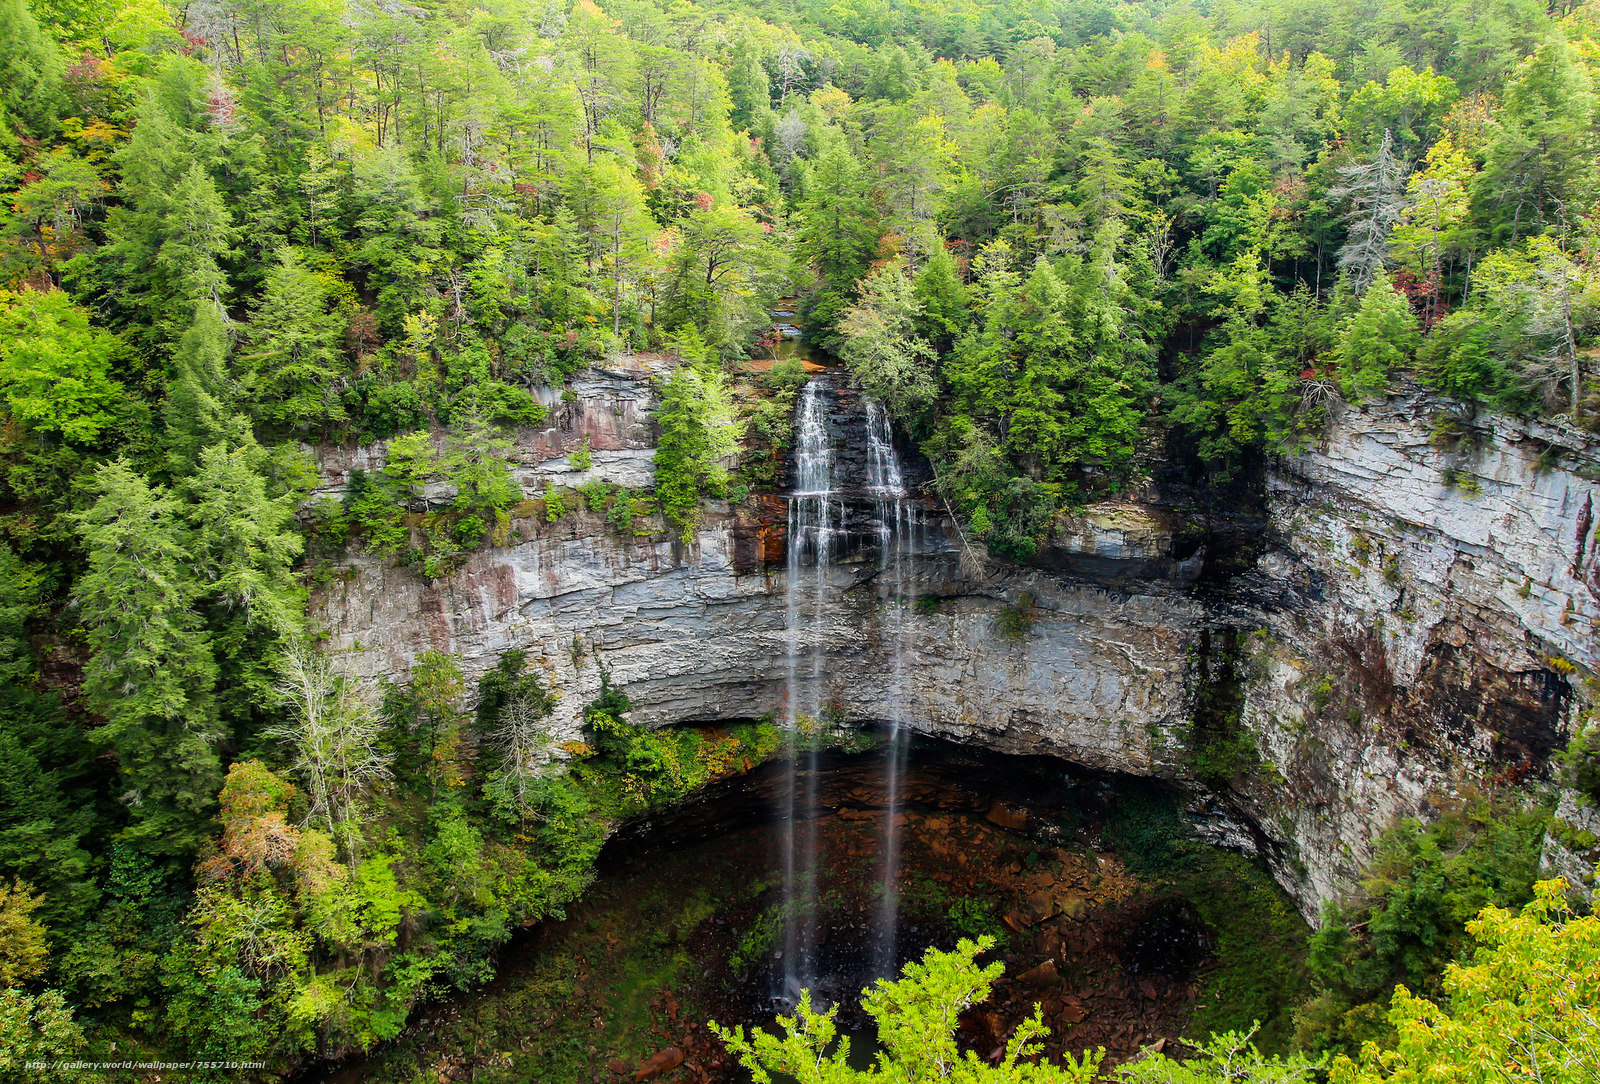 Falls Creek Falls State Park, Falls Creek Falls State Park, waterfall, rock, forest, trees, landscape